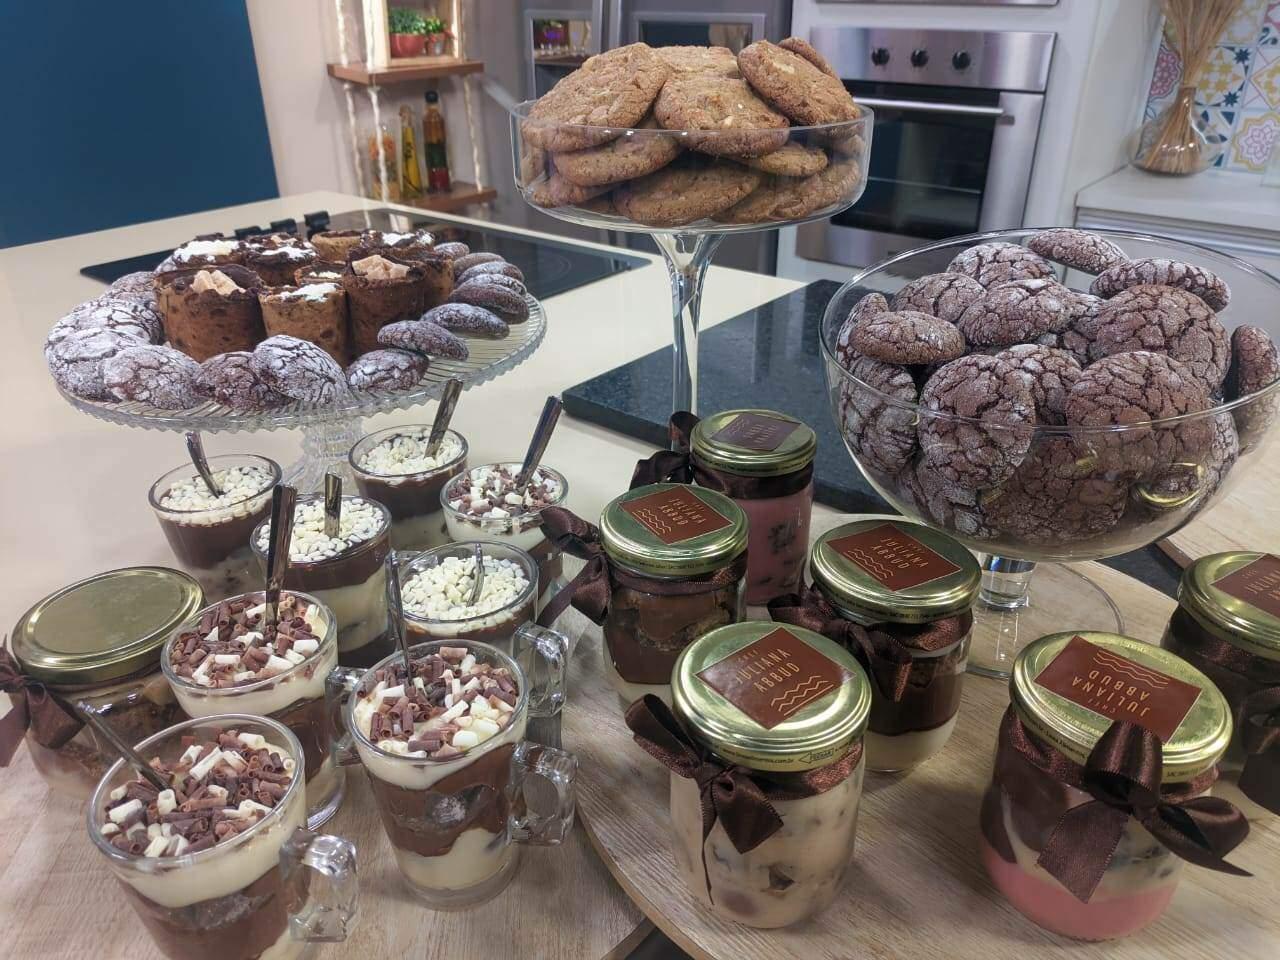 Cookies de colher - Santa Receita